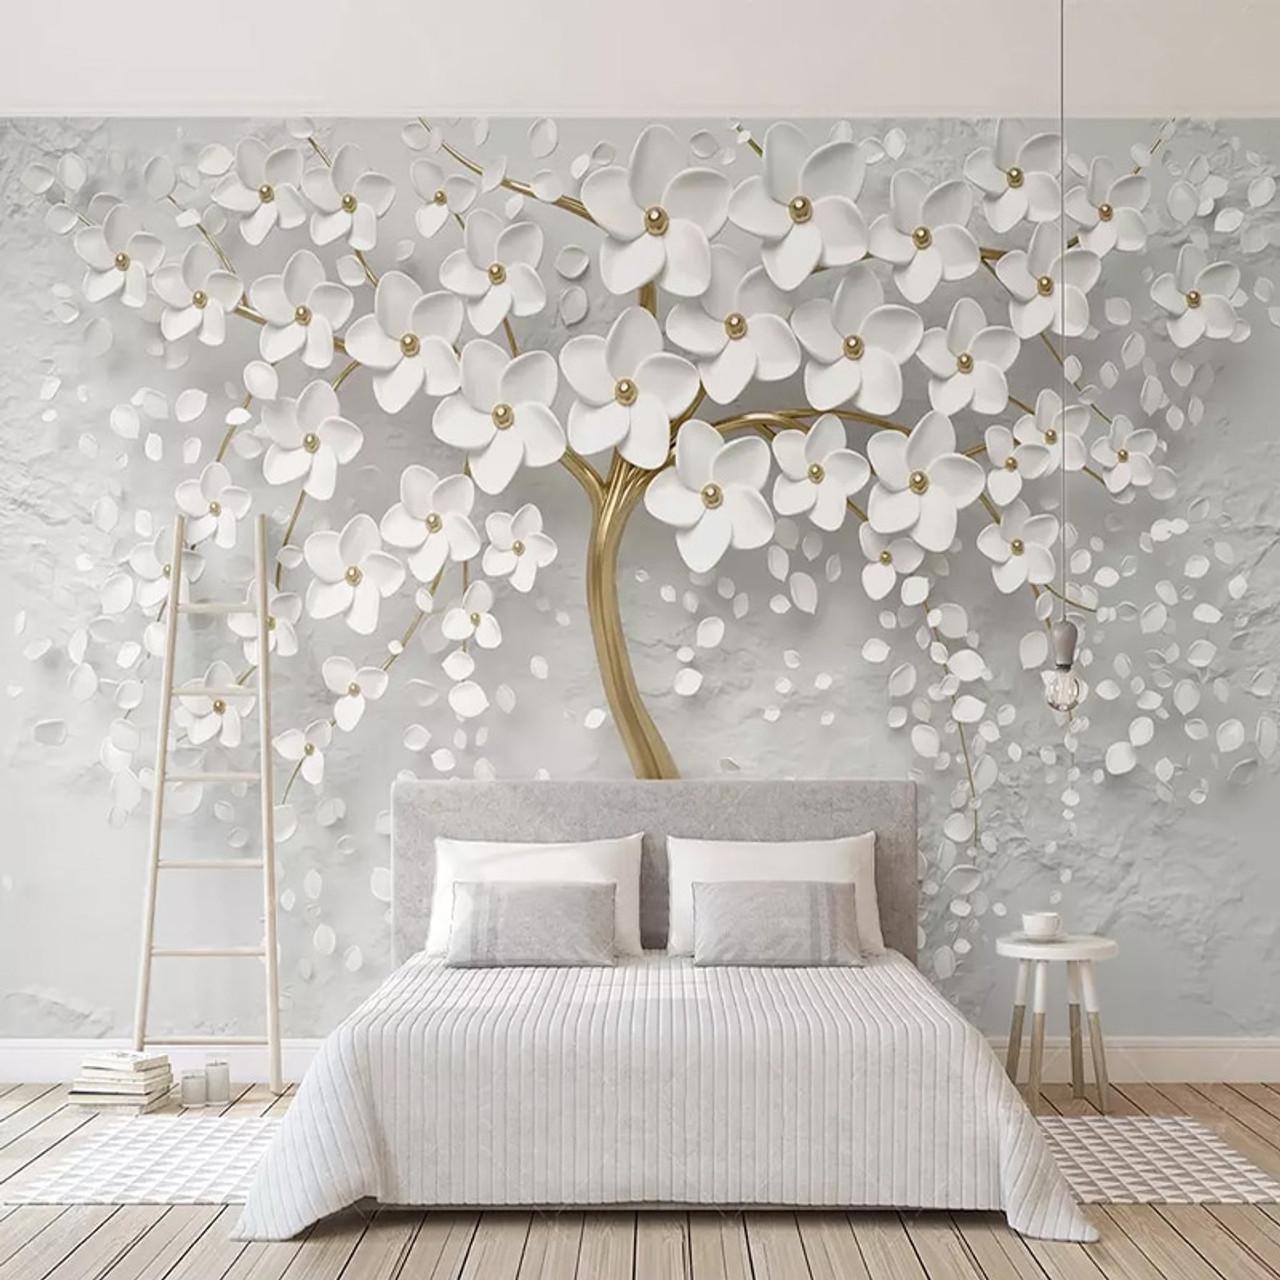 3d Mural Wallpaper For Bedroom